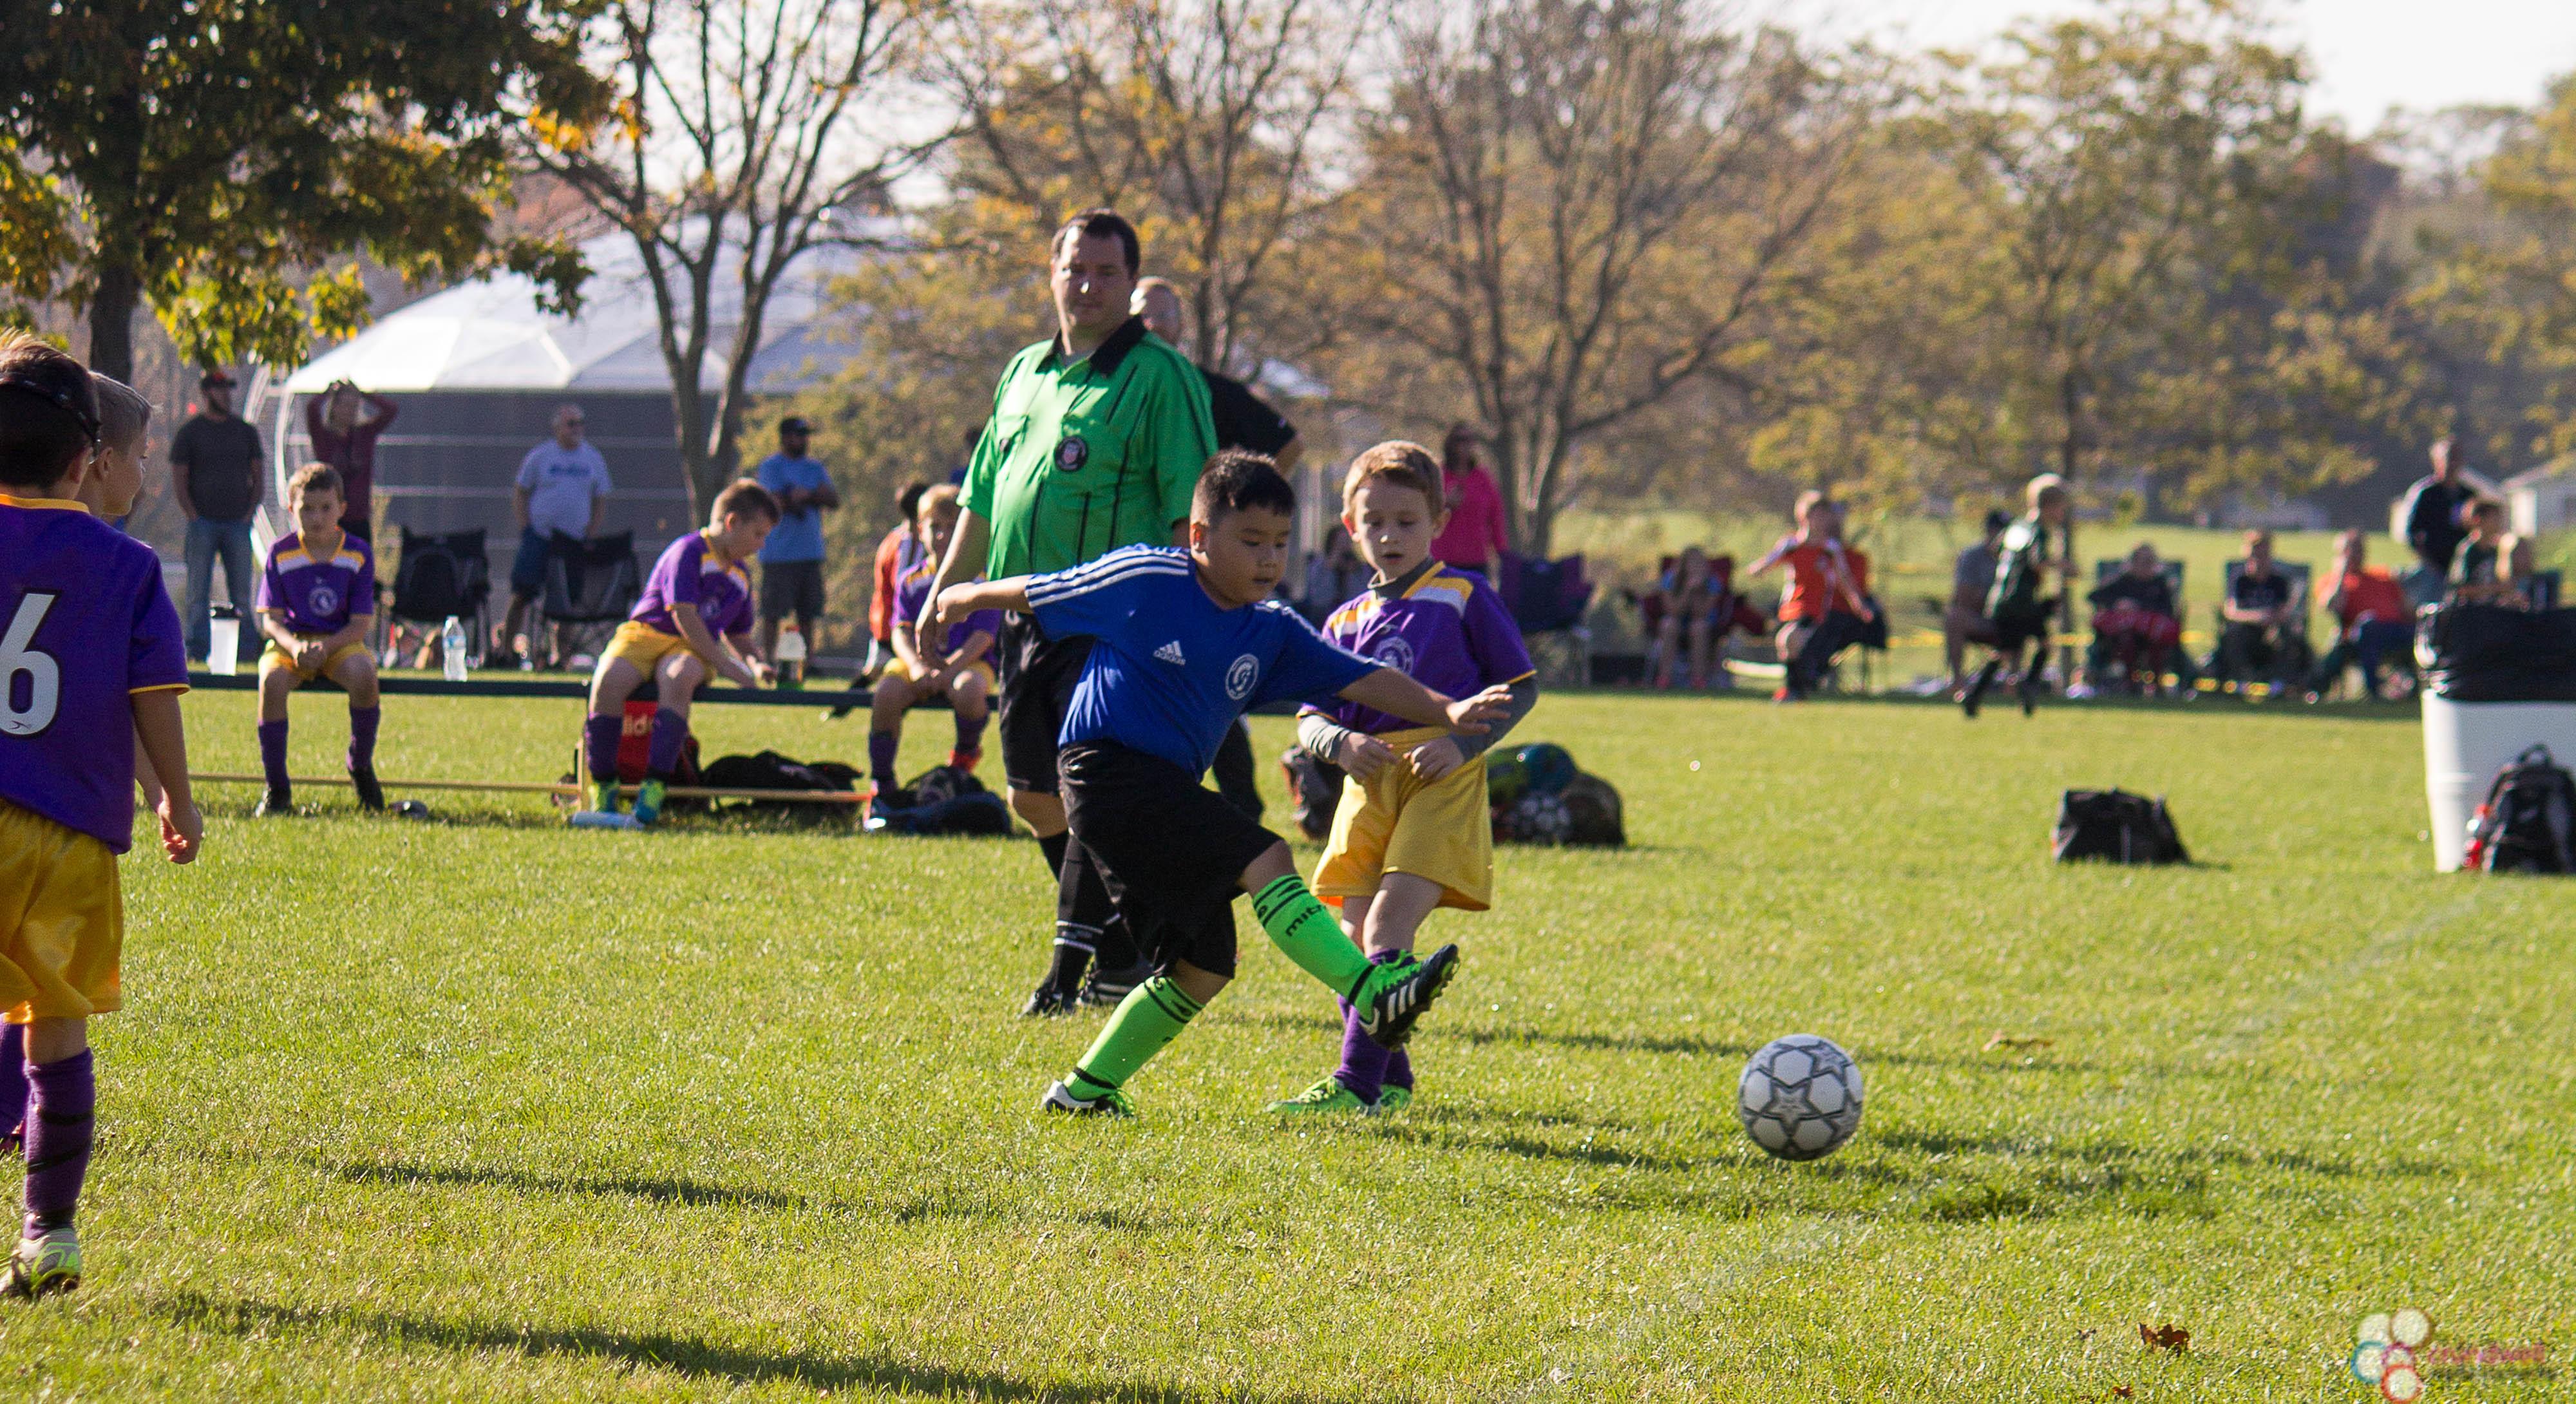 2017-10-14-Spartan-U9-Soccer-Final (38 of 134)